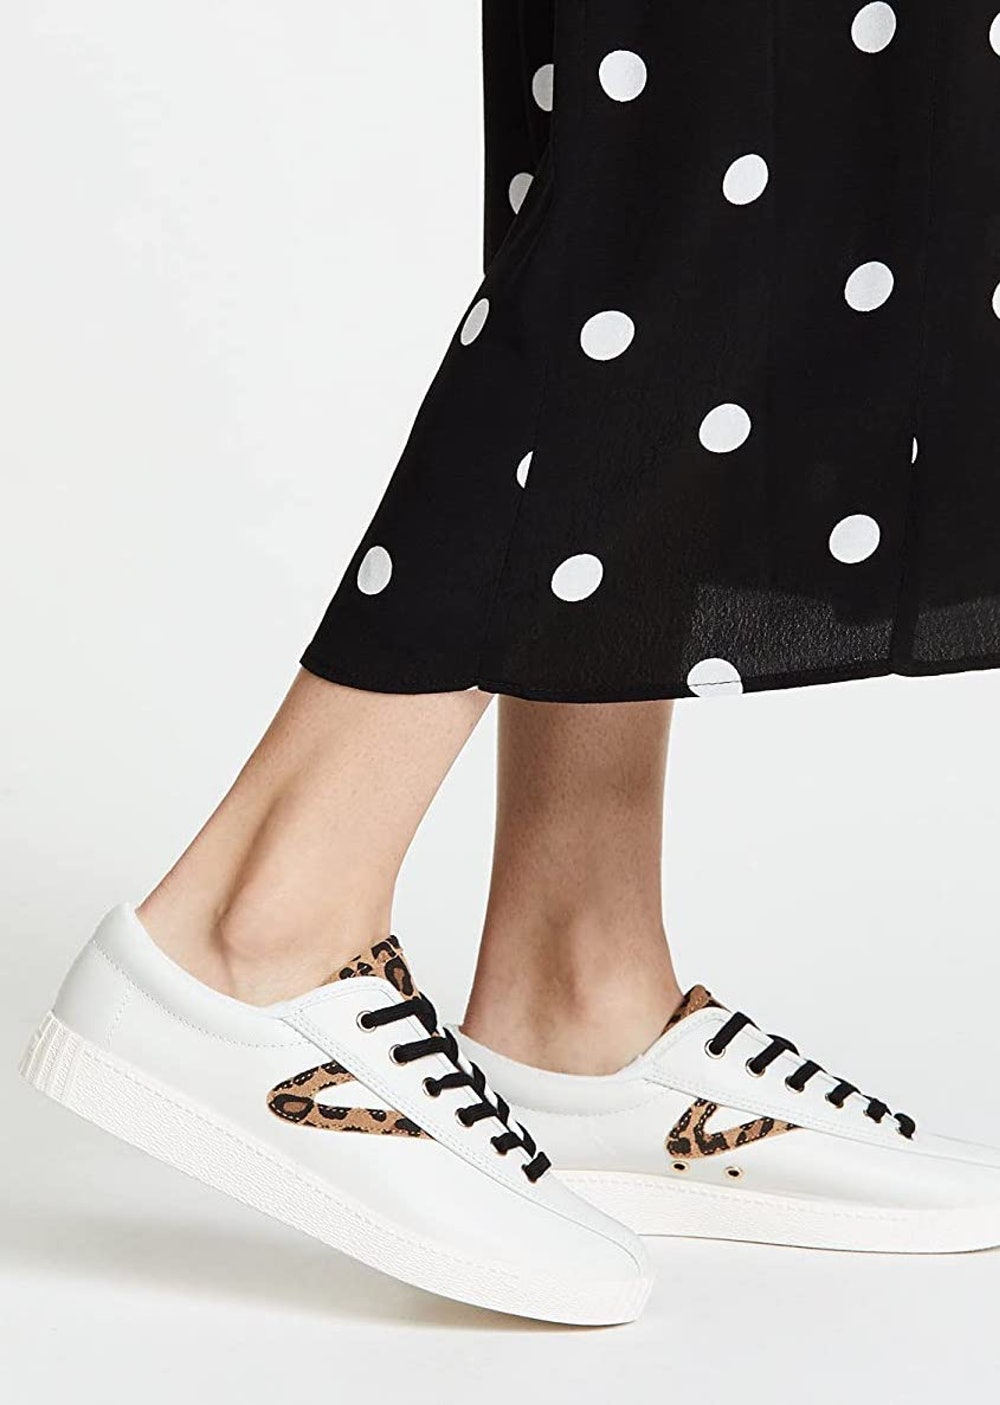 TRETORN Women's Nylite25plus Sneakers